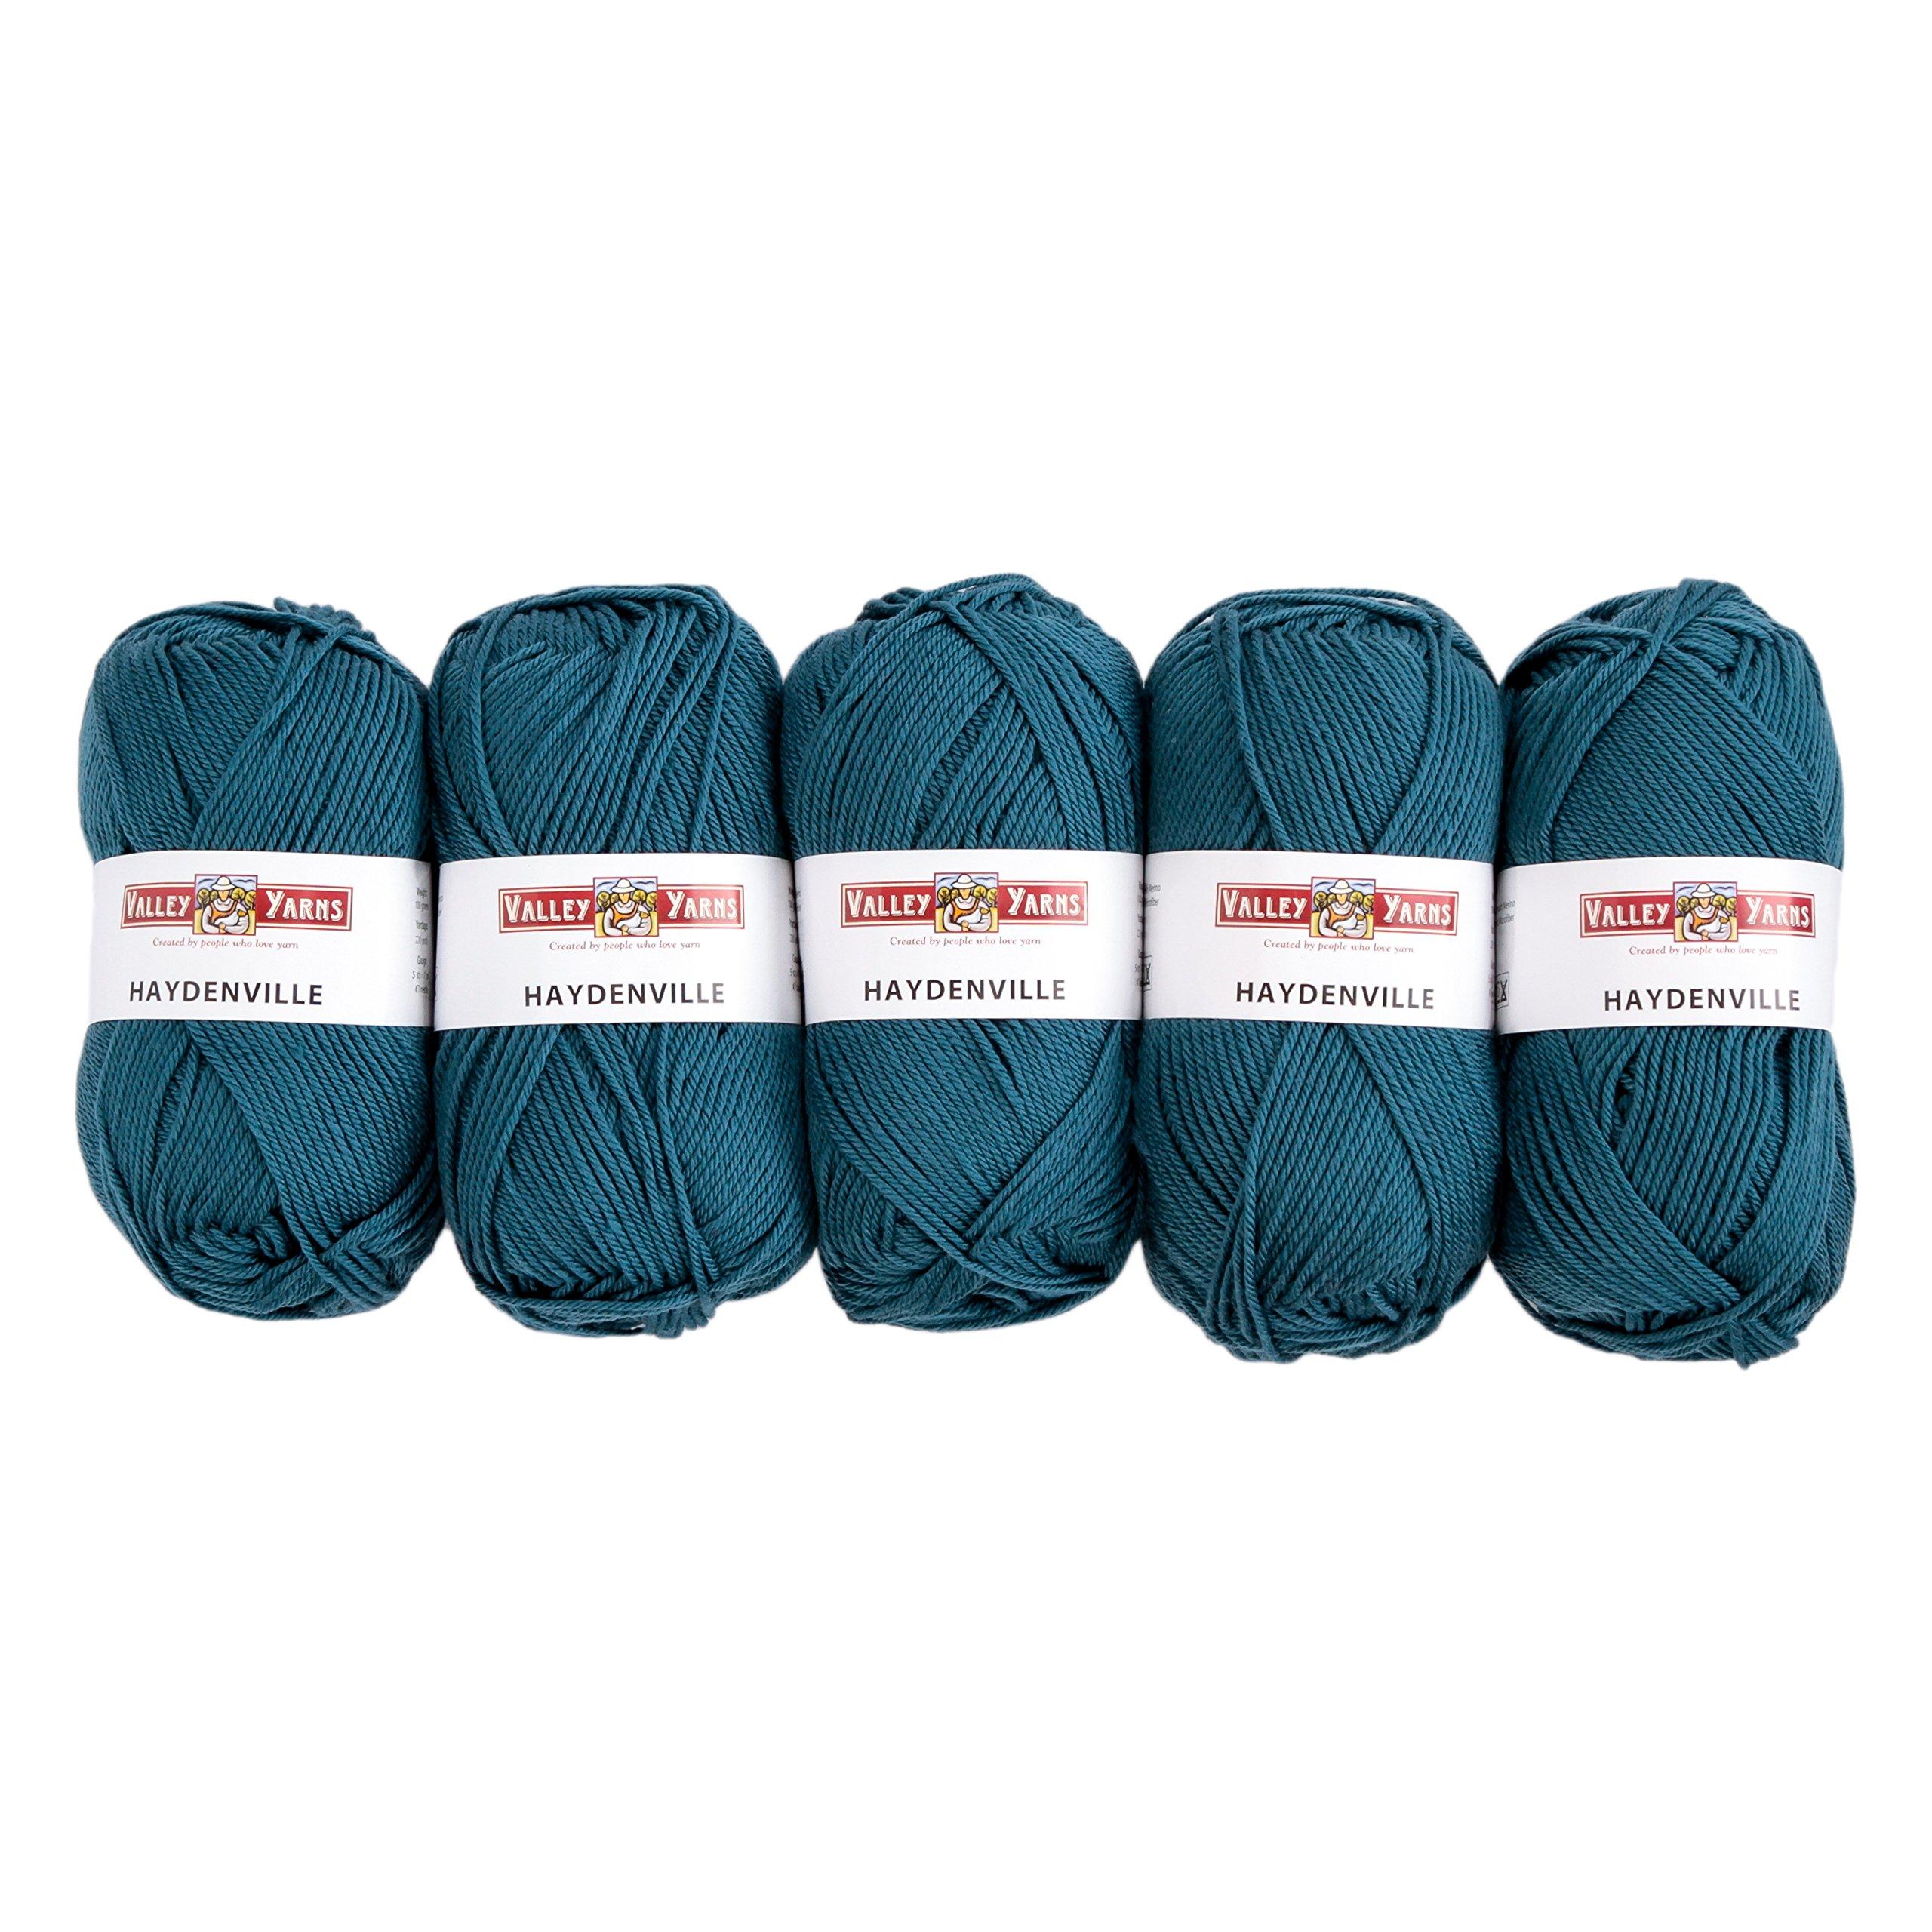 Valley Yarns Haydenville 5-Pack (Washable Worsted Weight Yarn, 60% Superwash Merino Wool/ 40% Acrylic Microfiber) - #11 Teal